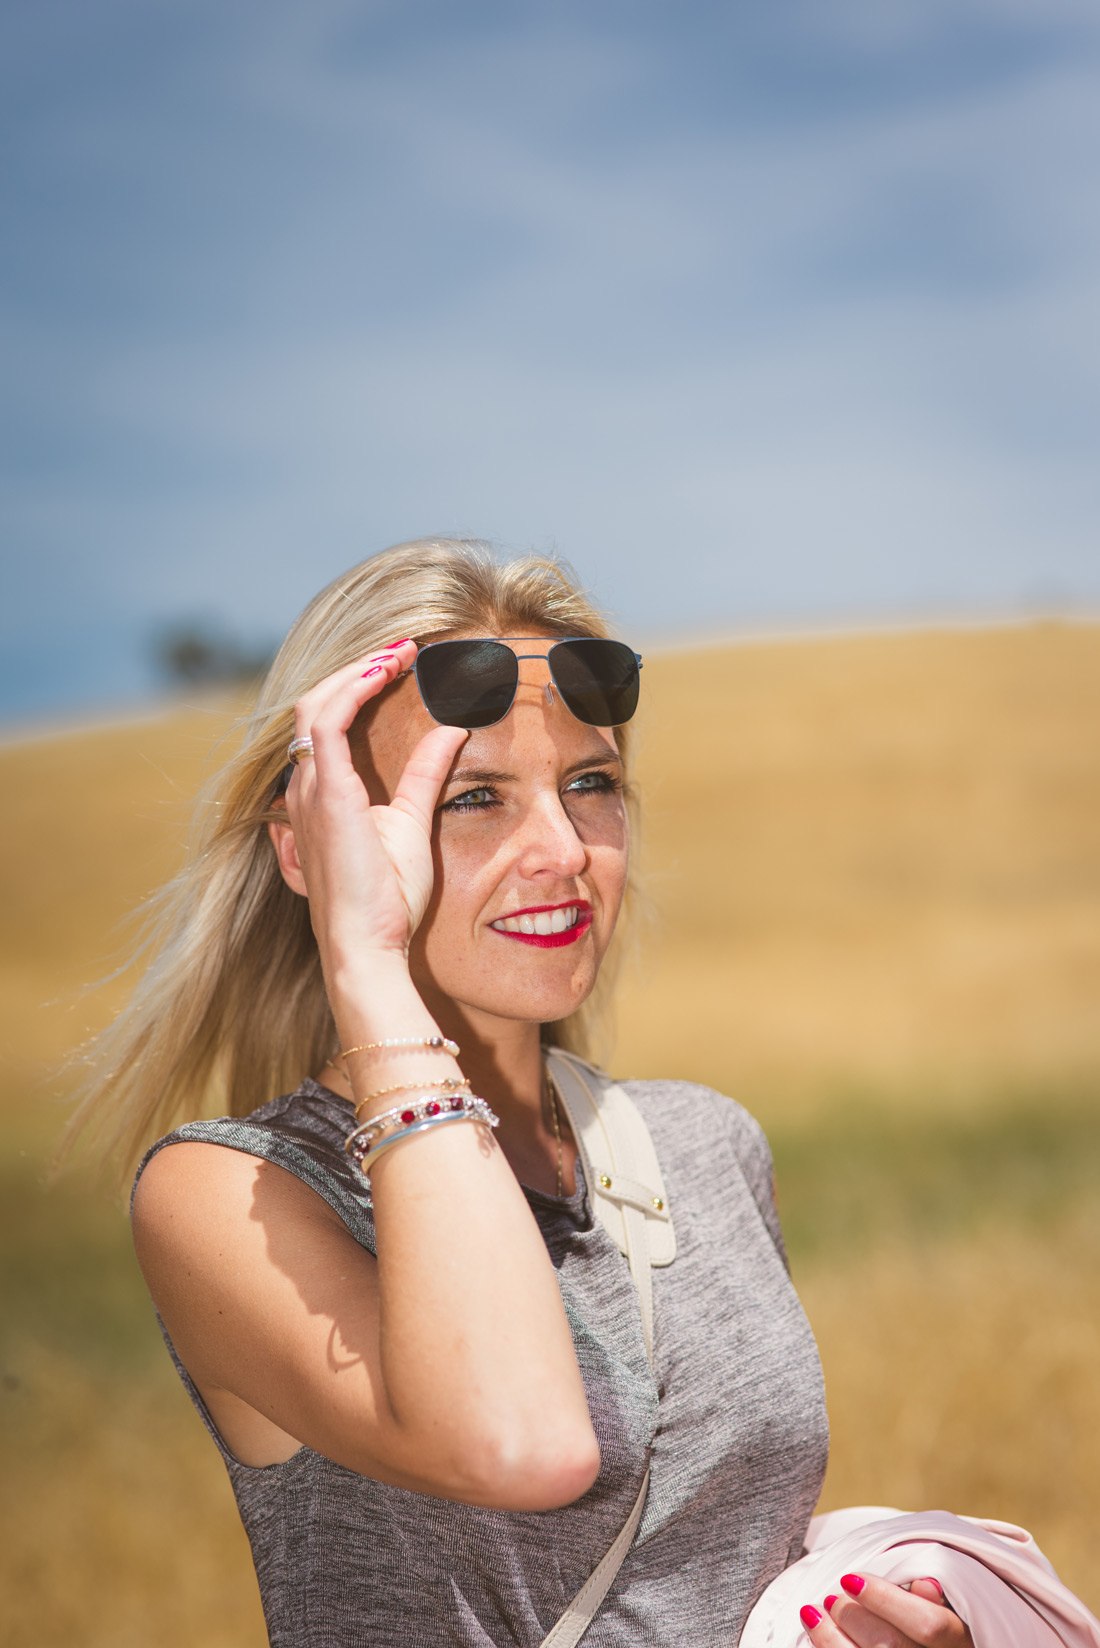 Bag-at-you---Fashion-blog---Mykita-Sunglasses